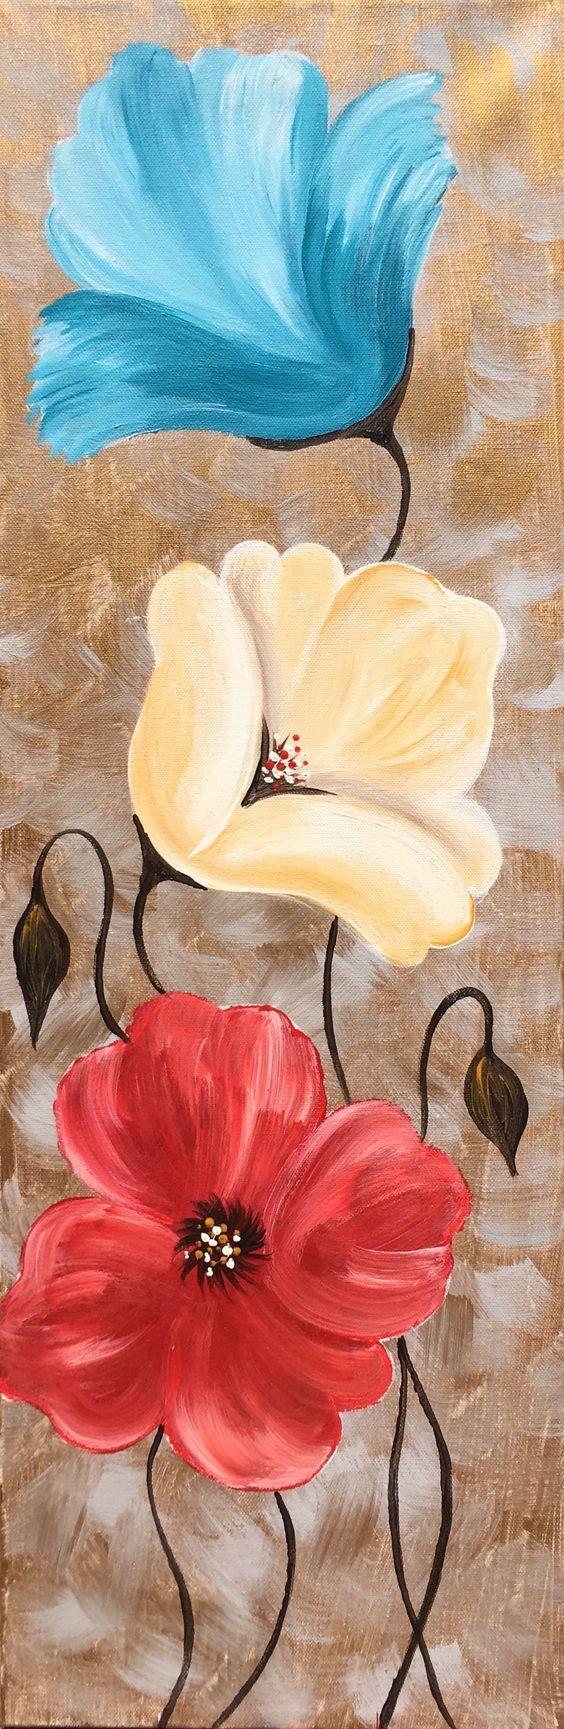 Www Pinotspalette Com Content Studio Huntsville Images Colorful Poppies Jpg V 1000 Art Painting Acrylic Art Painting Art